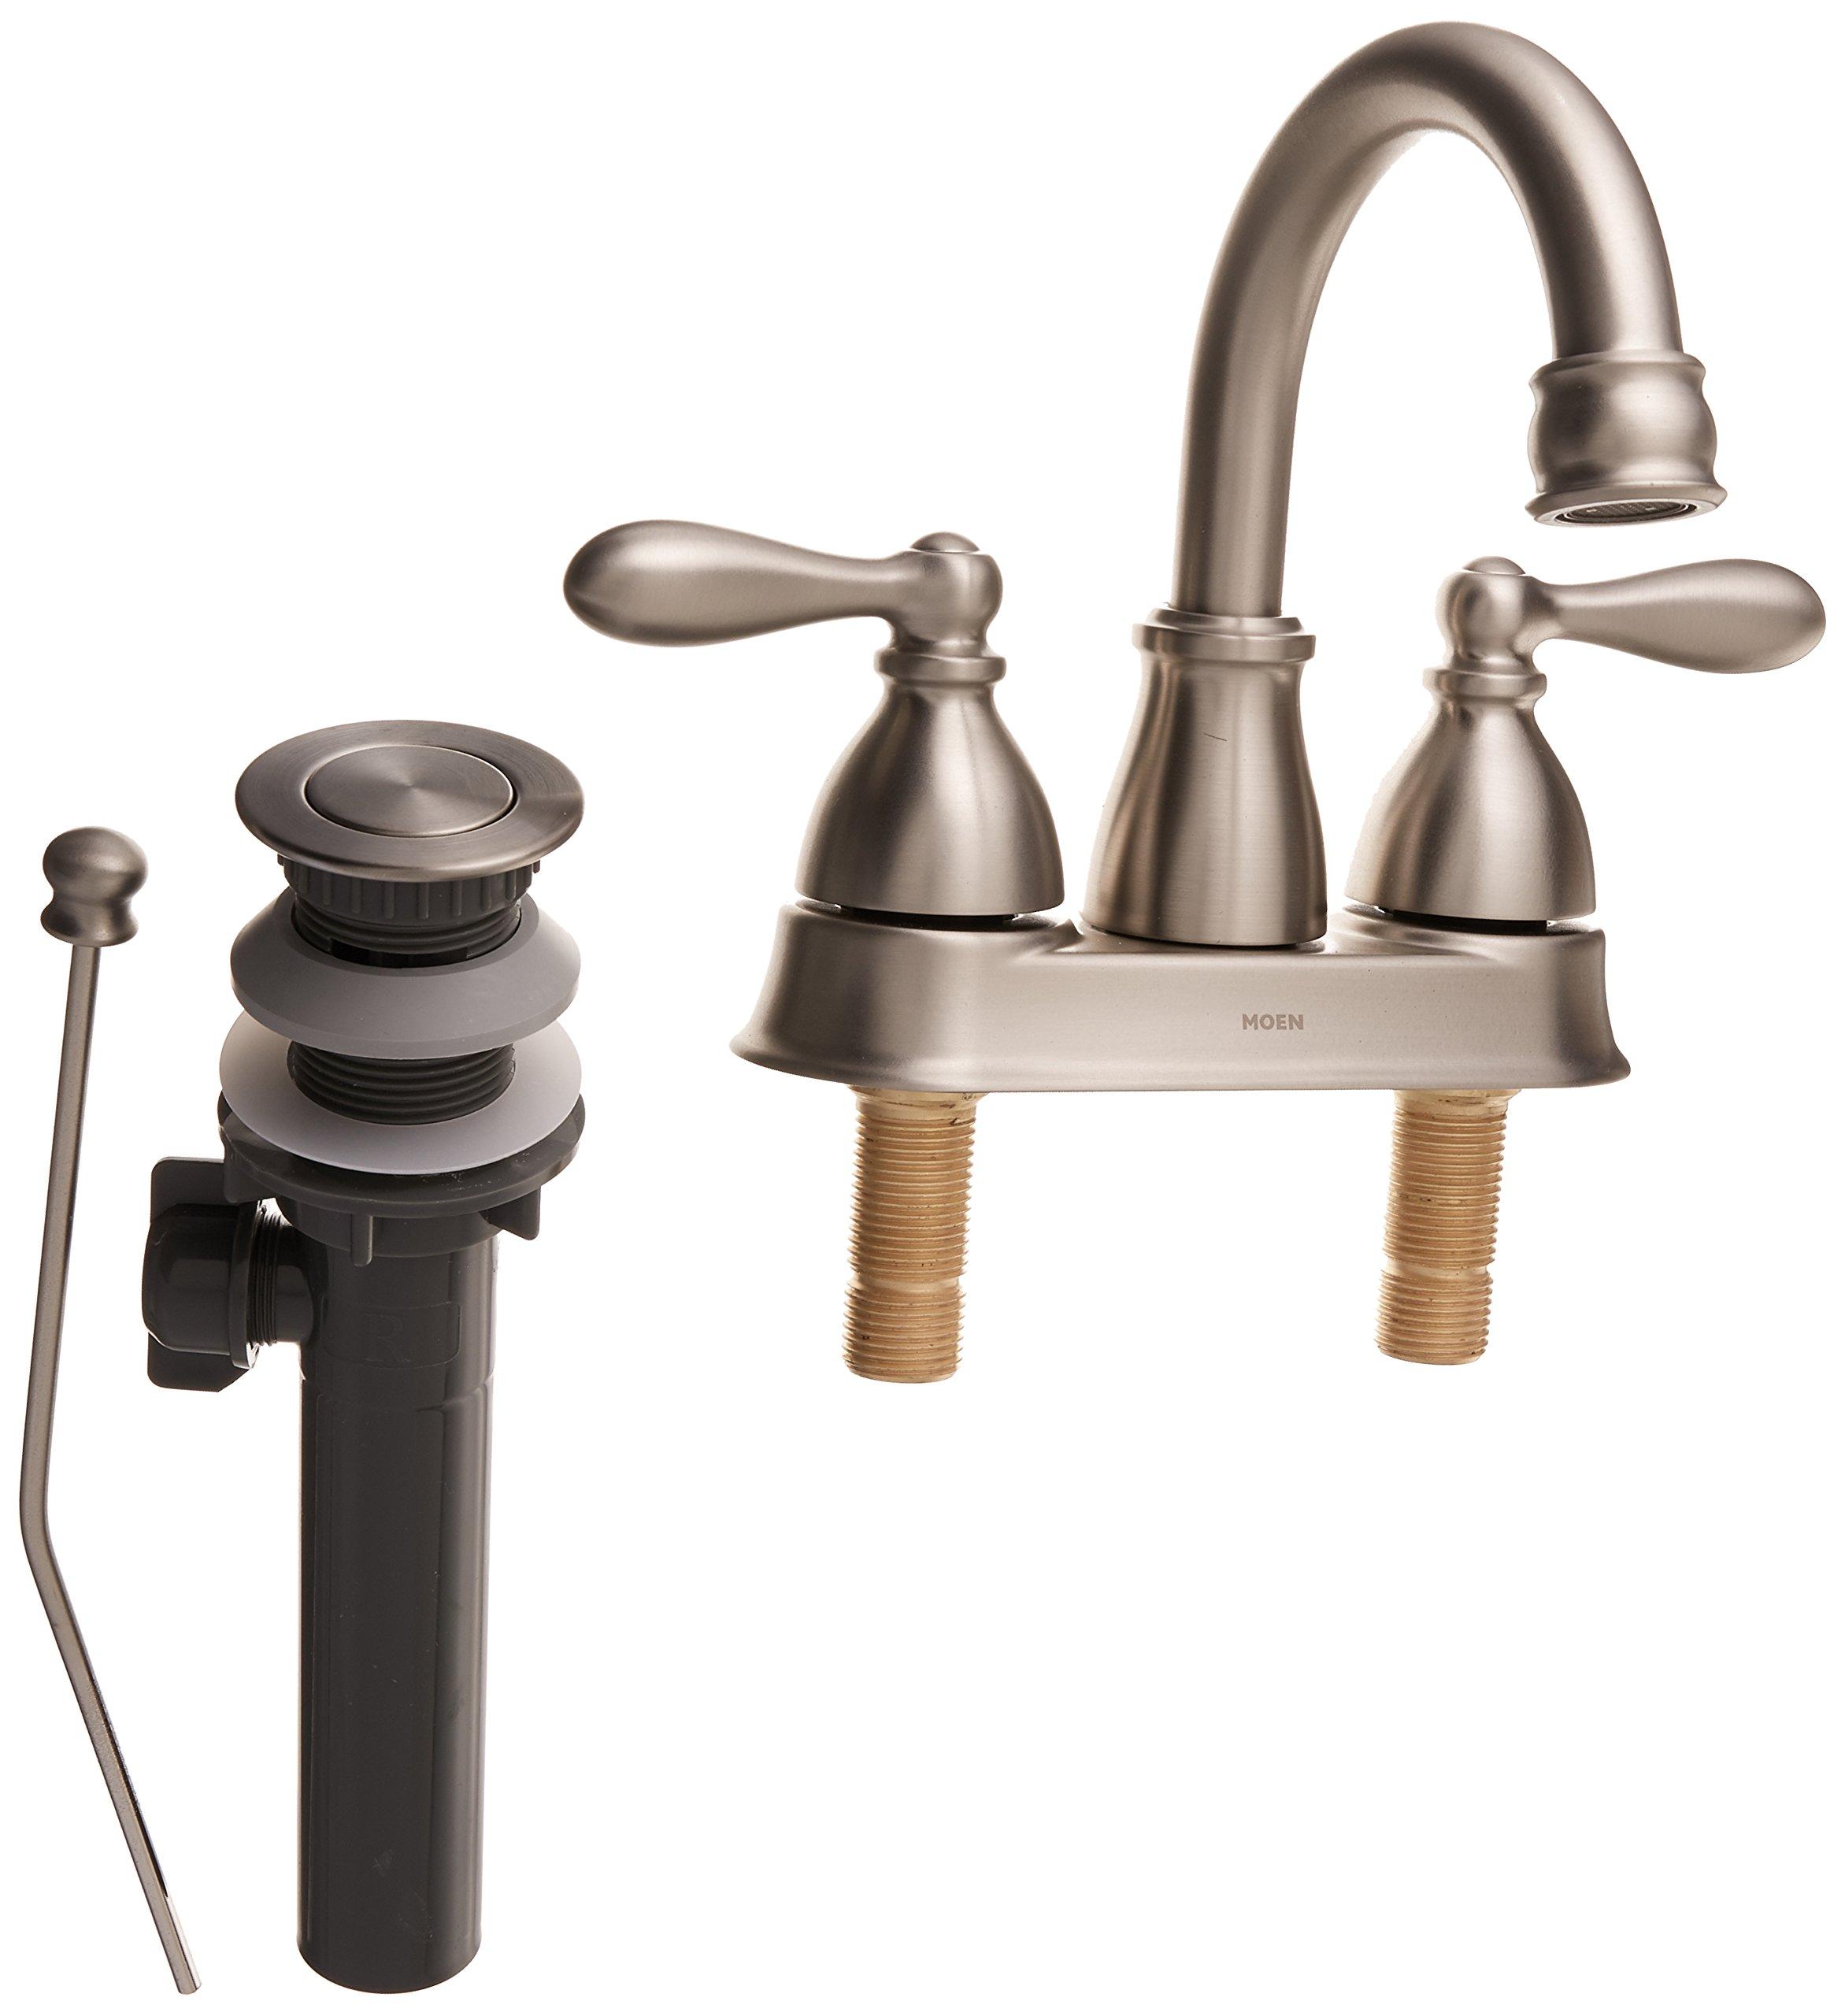 Moen WS84667SRN Caldwell Two-Handle Bathroom Faucet High Arc Lavatory Sink Centerset, Spot Resist Brushed Nickel